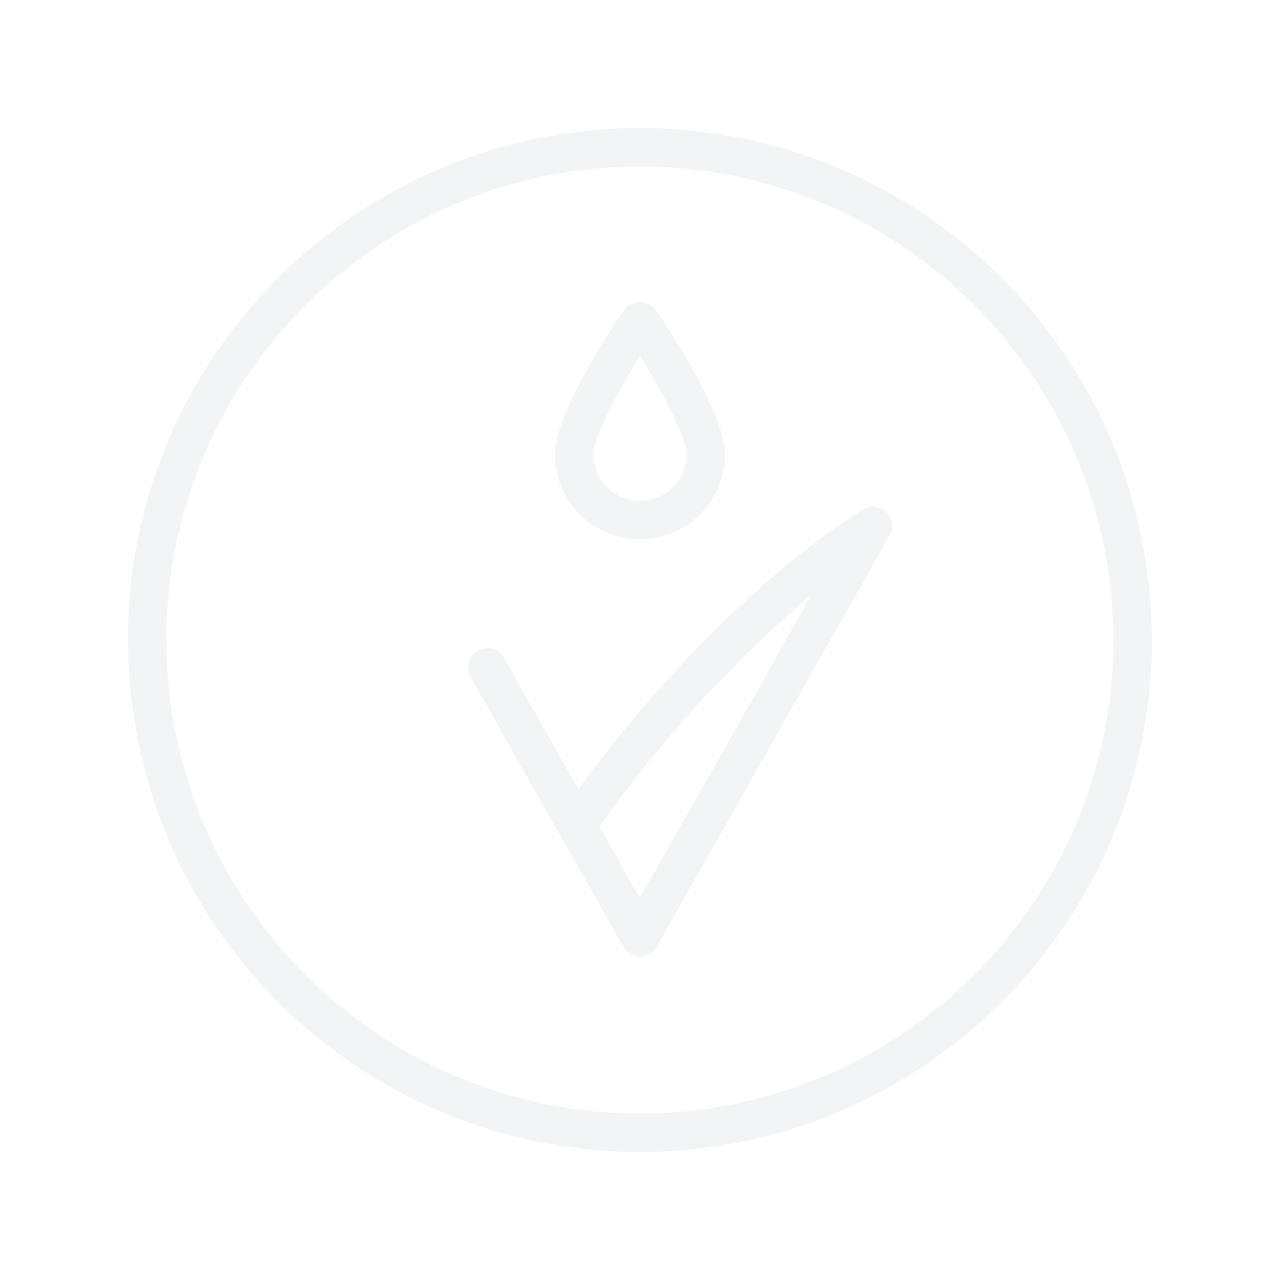 CLARINS Super Restorative Day Cream (Very Dry Skin) 50ml